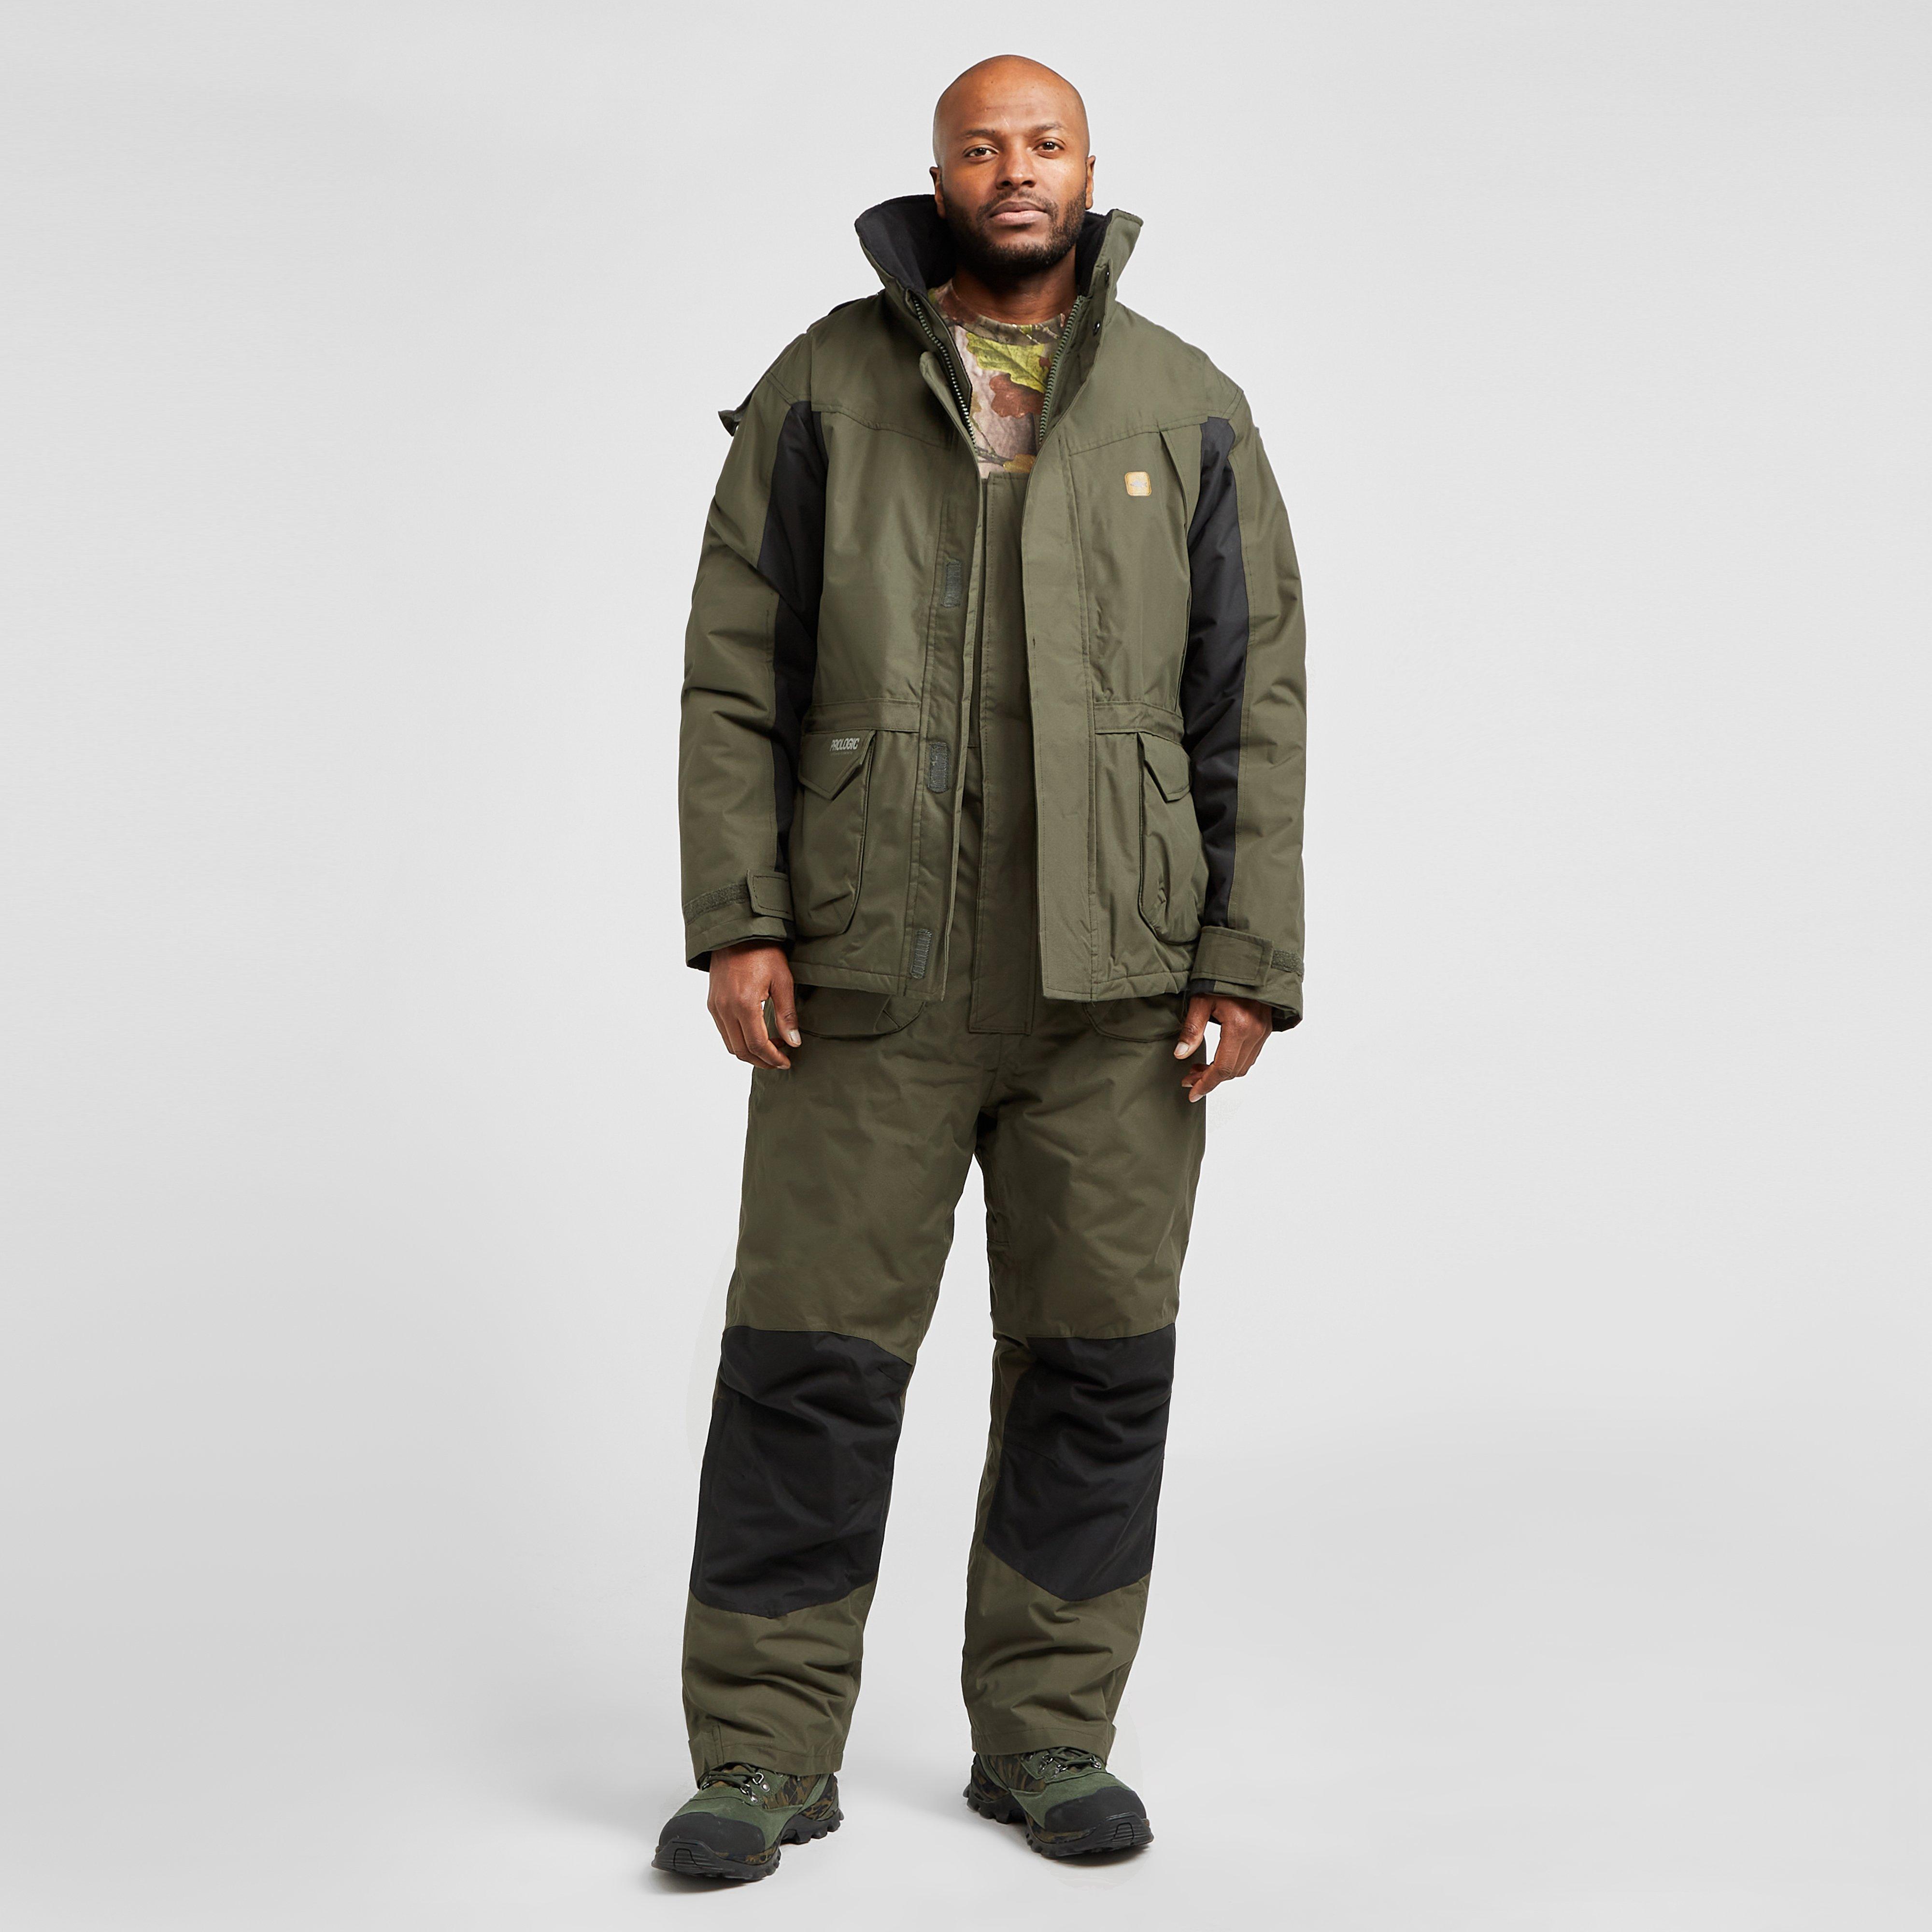 Prologic Pl Highgrade Thermo Suit - Khaki/Suit, Khaki